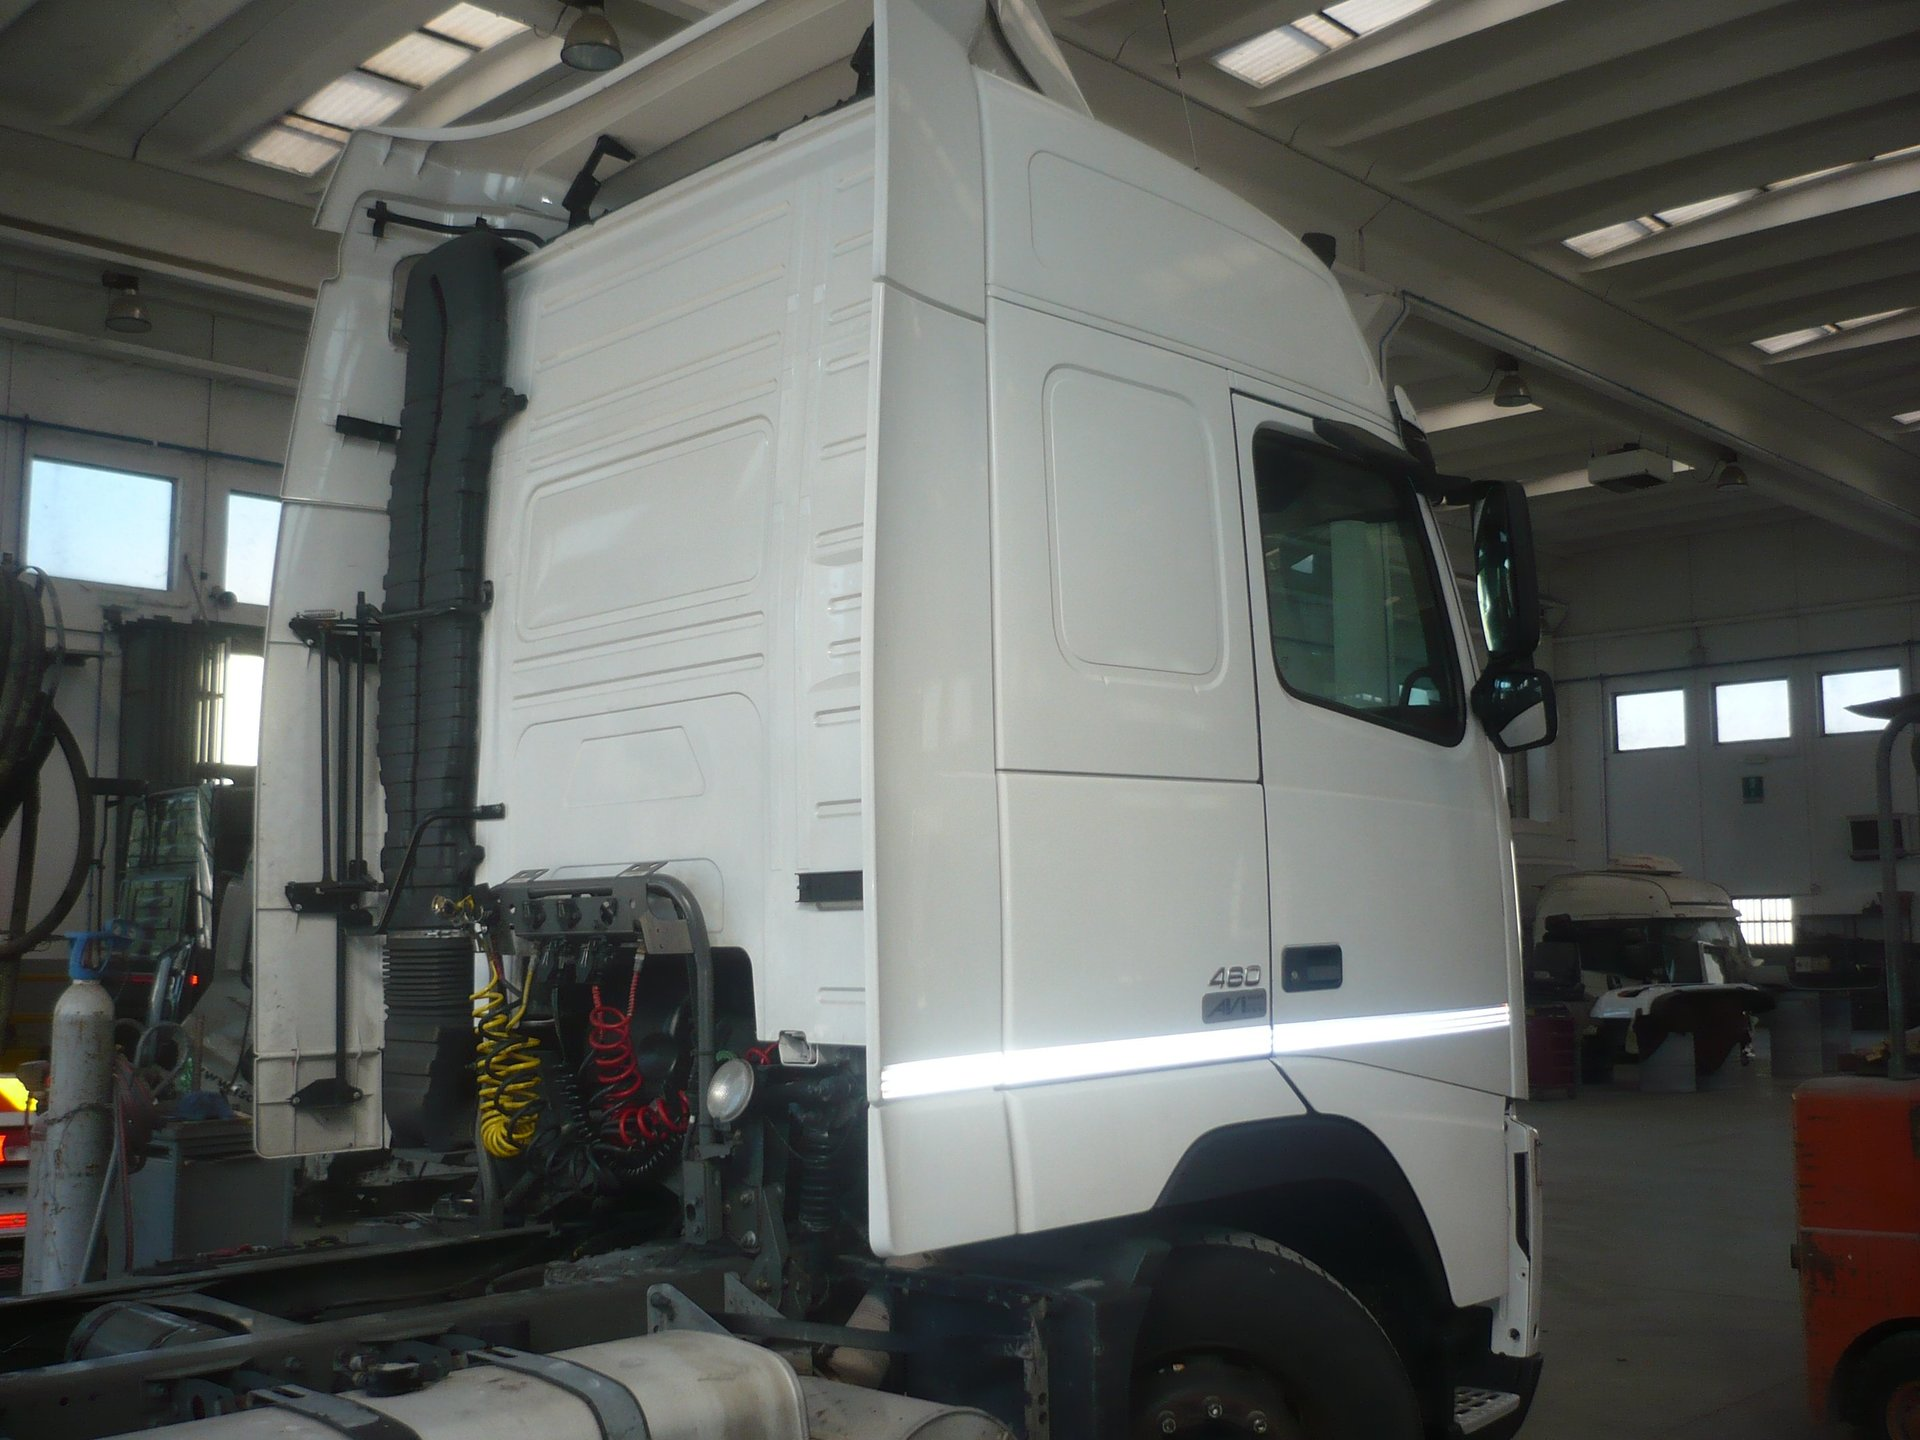 Cabina Volvo Fh V2 460 Gt Completa Vista Trequarti Dietro